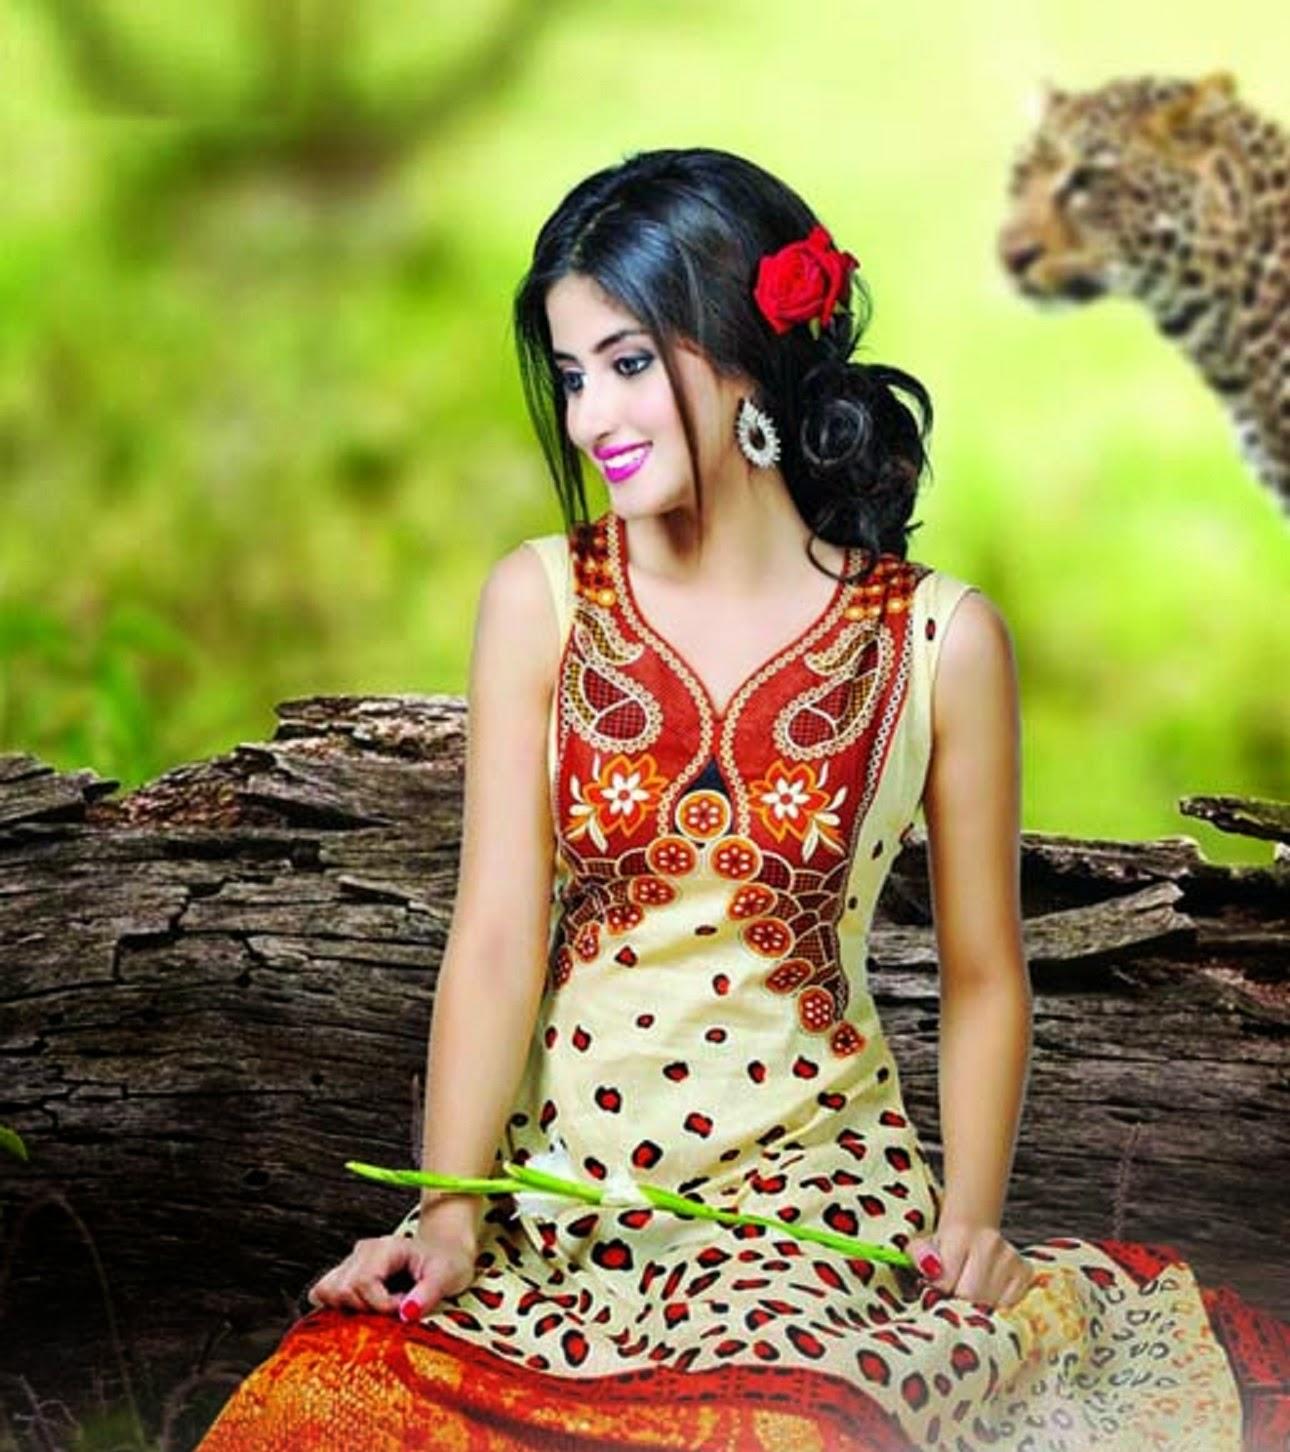 New Year 2014 Hd Wallpapers Dynamic Views Very Pretty Pakistani Actress Sajal Ali